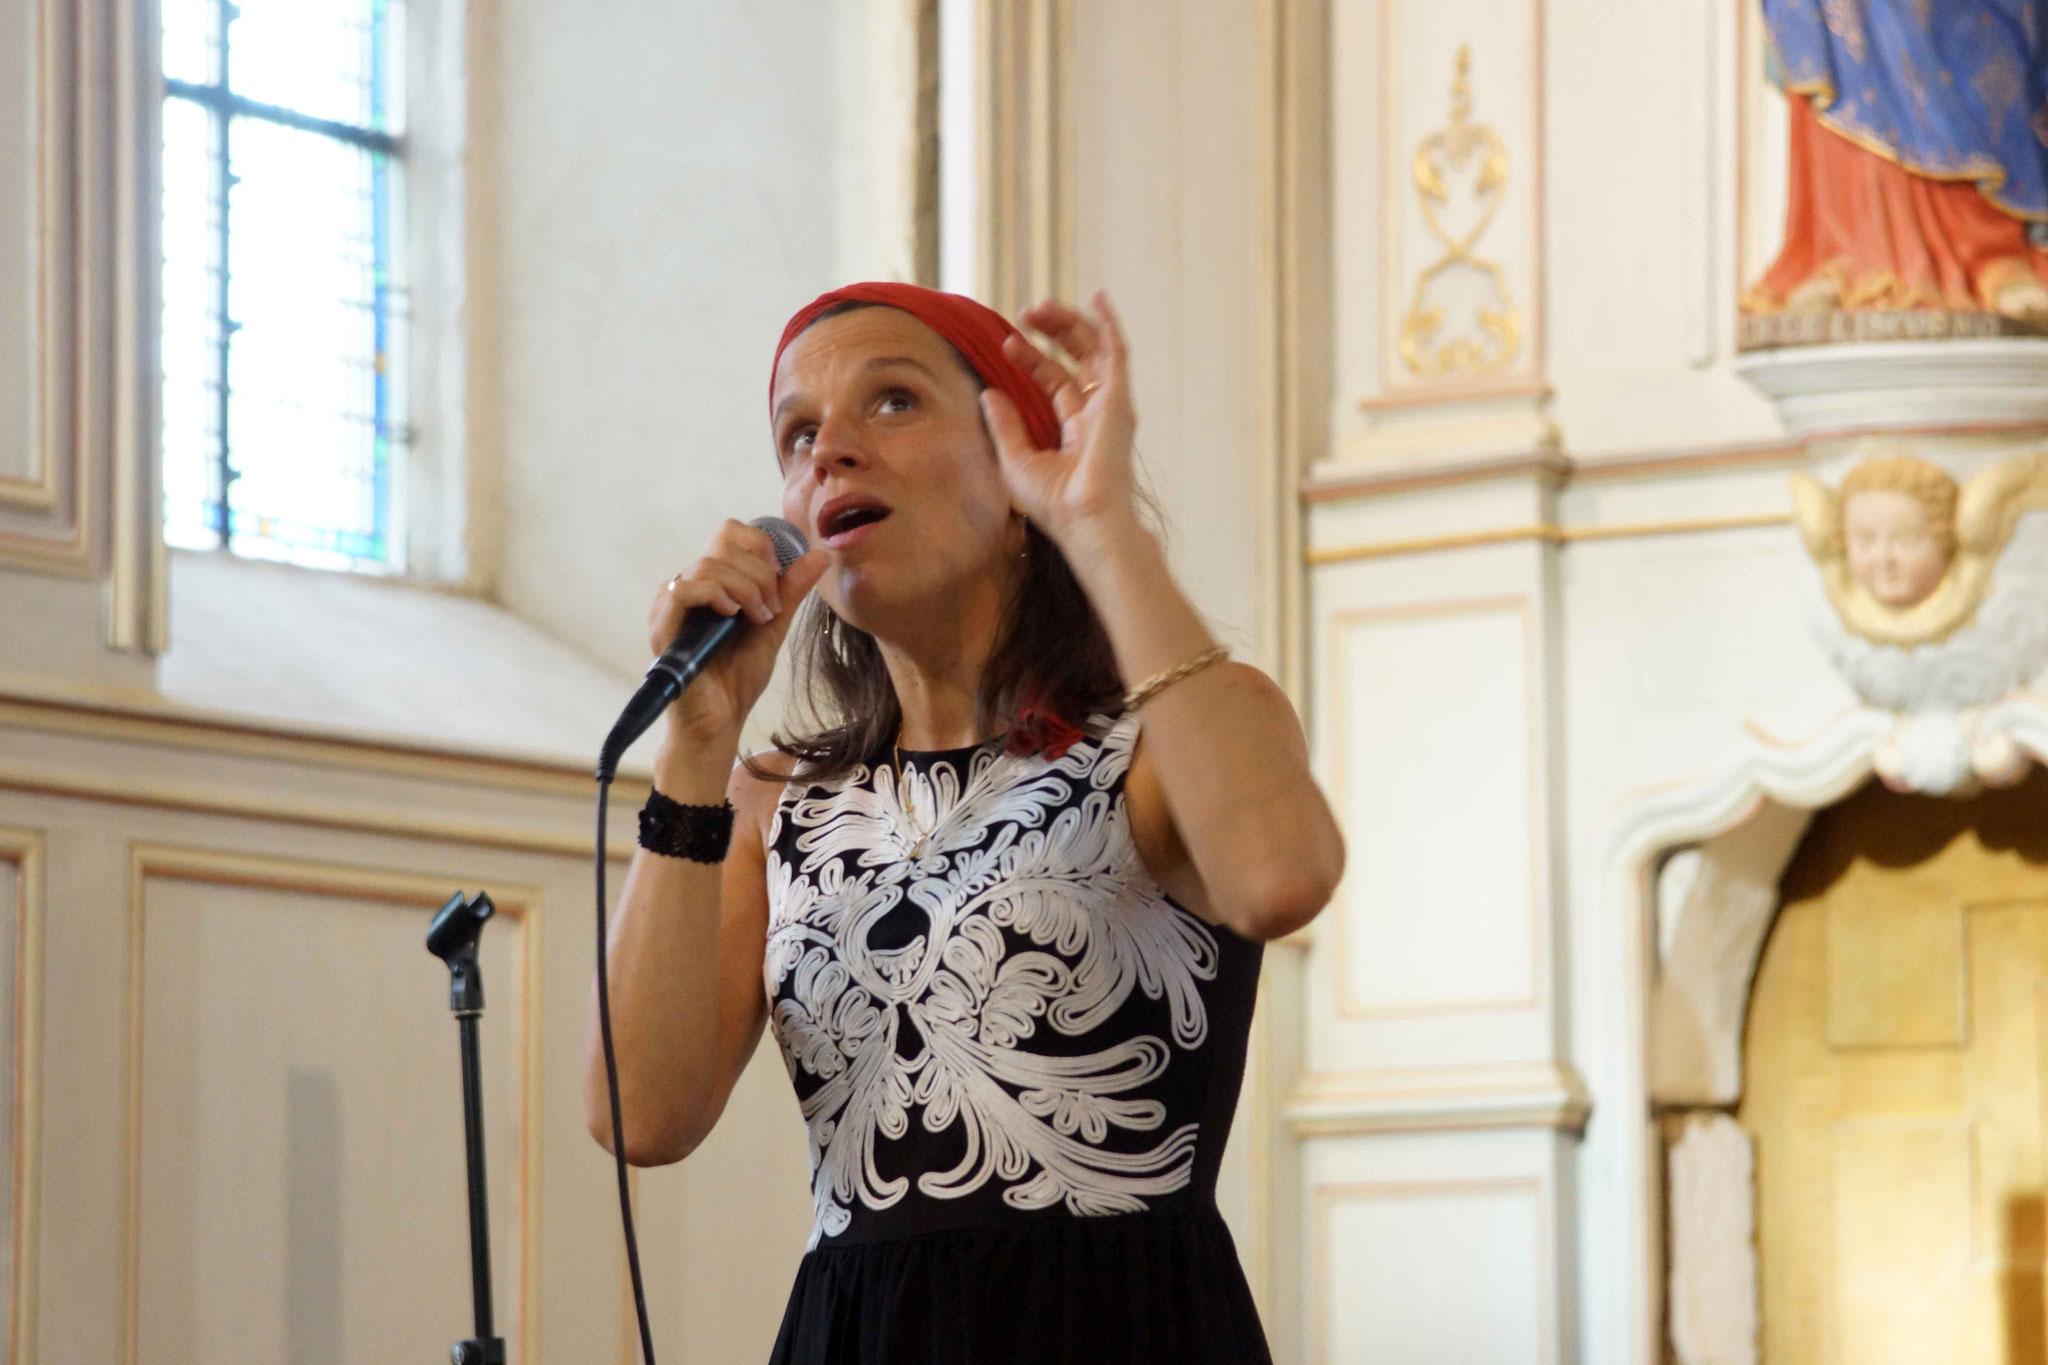 Concert de Liscorno, Lannebert Dimanche 9 Octobre ~ 5